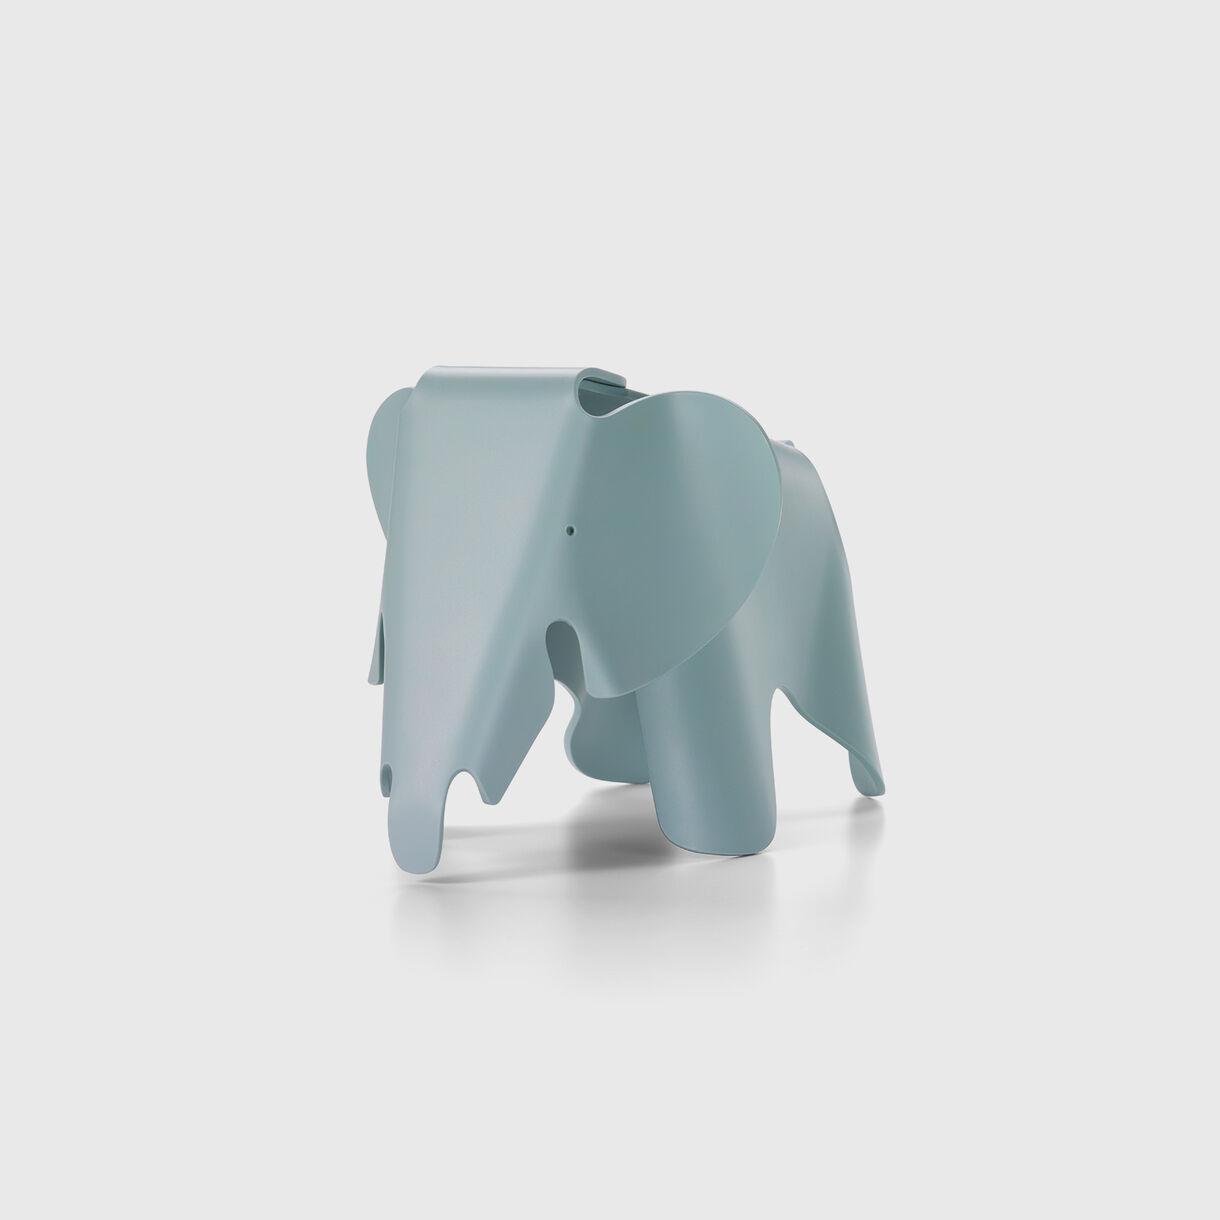 Eames Elephant Small, Ice Grey